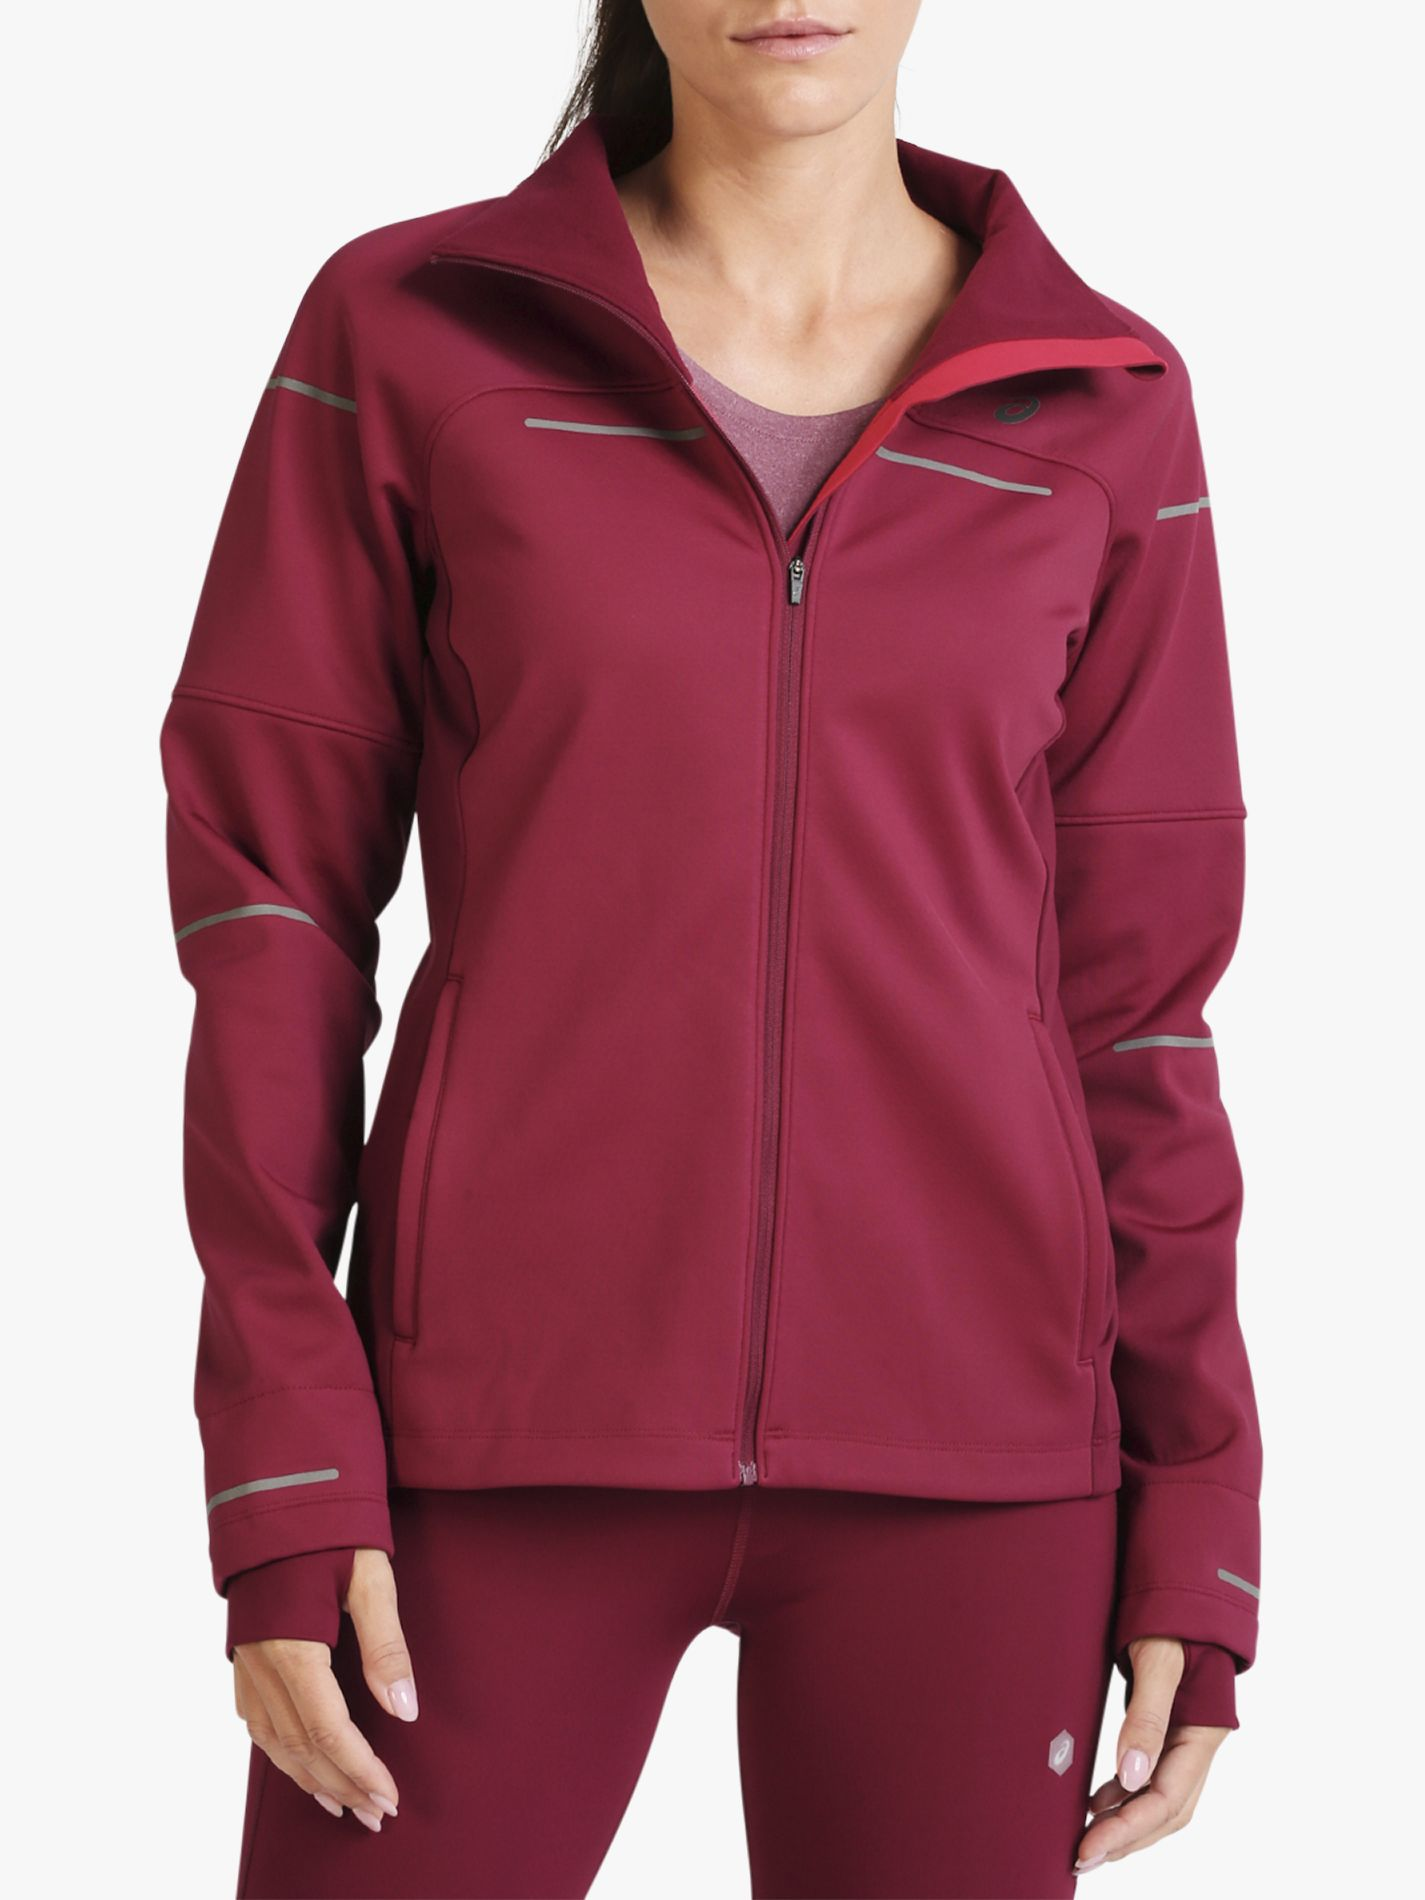 asics running jacket womens Shop Clothing & Shoes Online